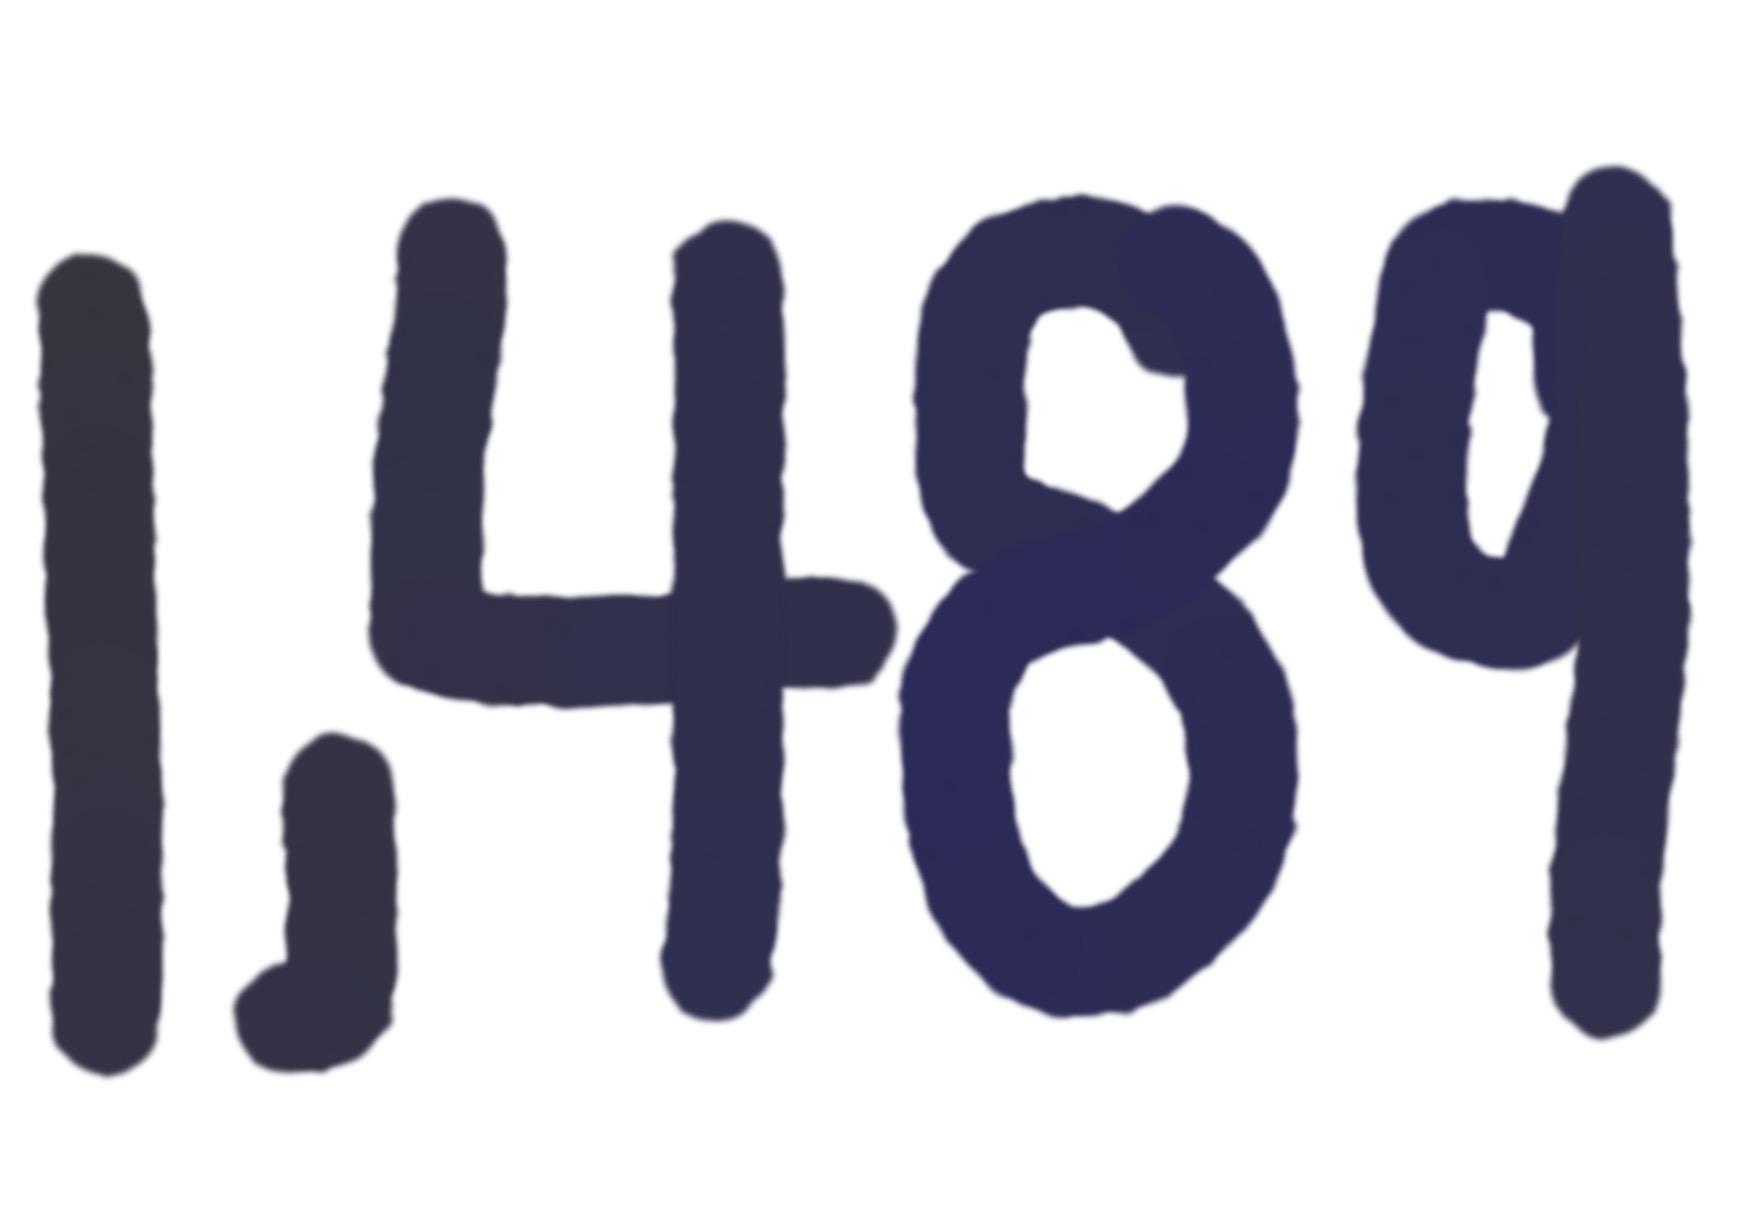 1,489